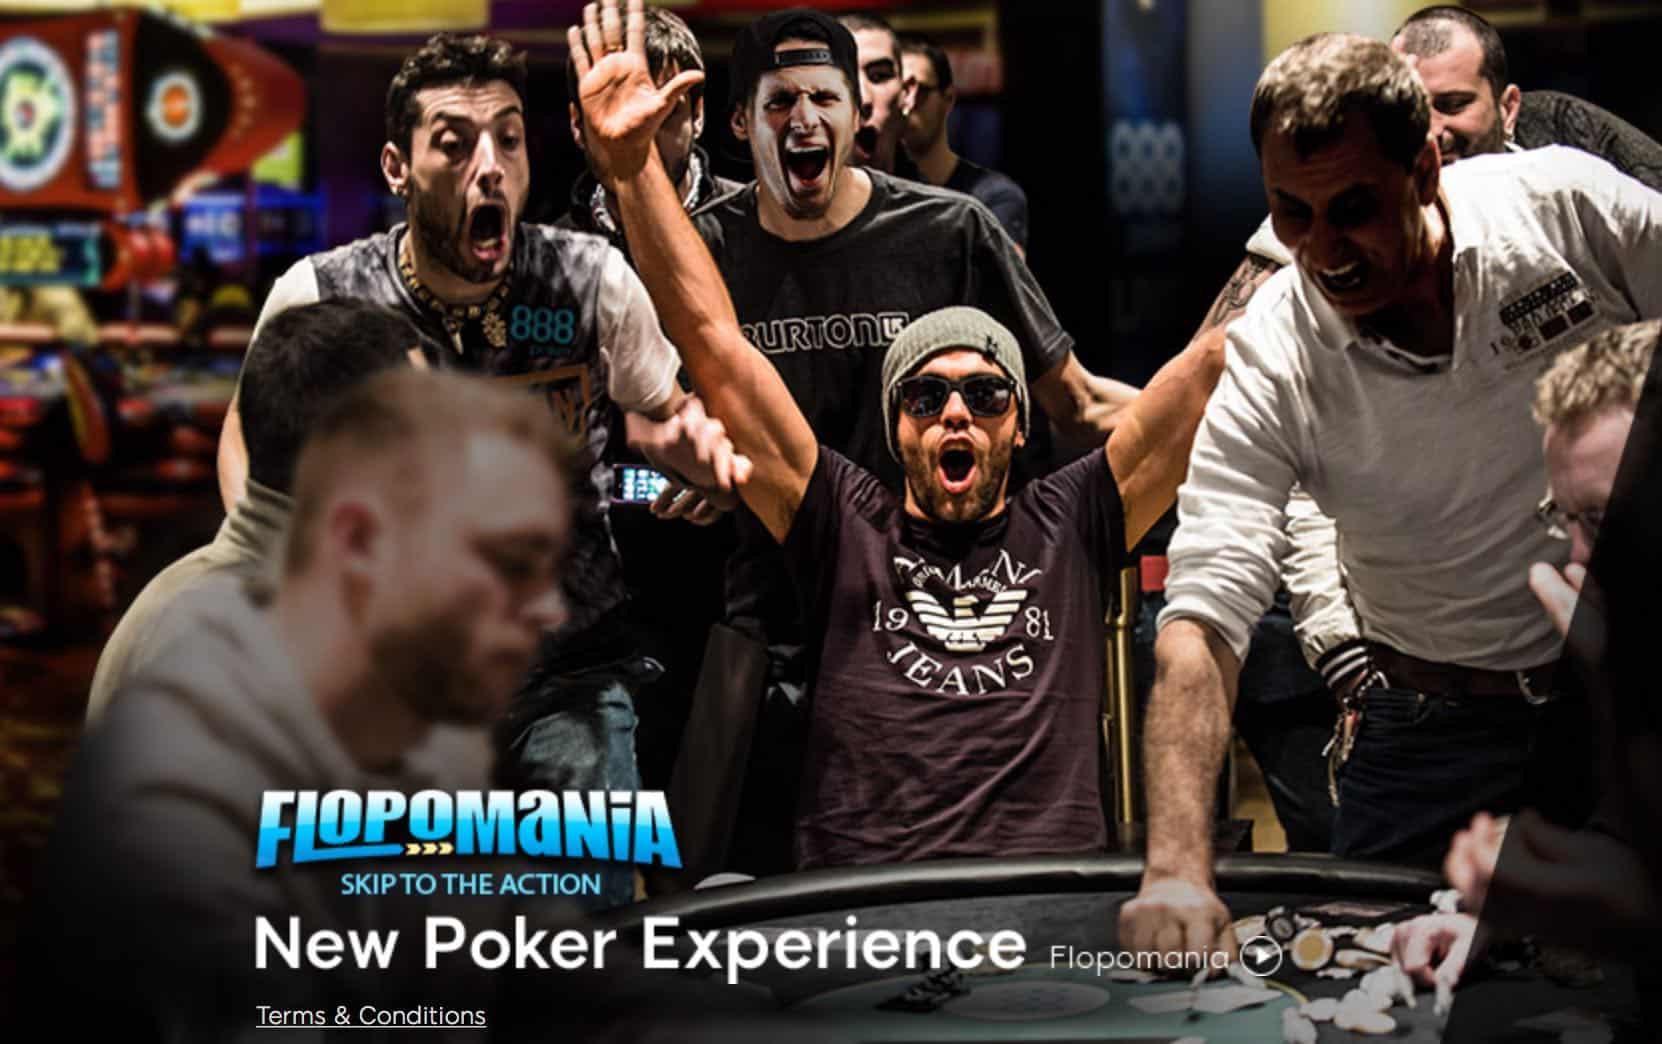 888 poker NJ